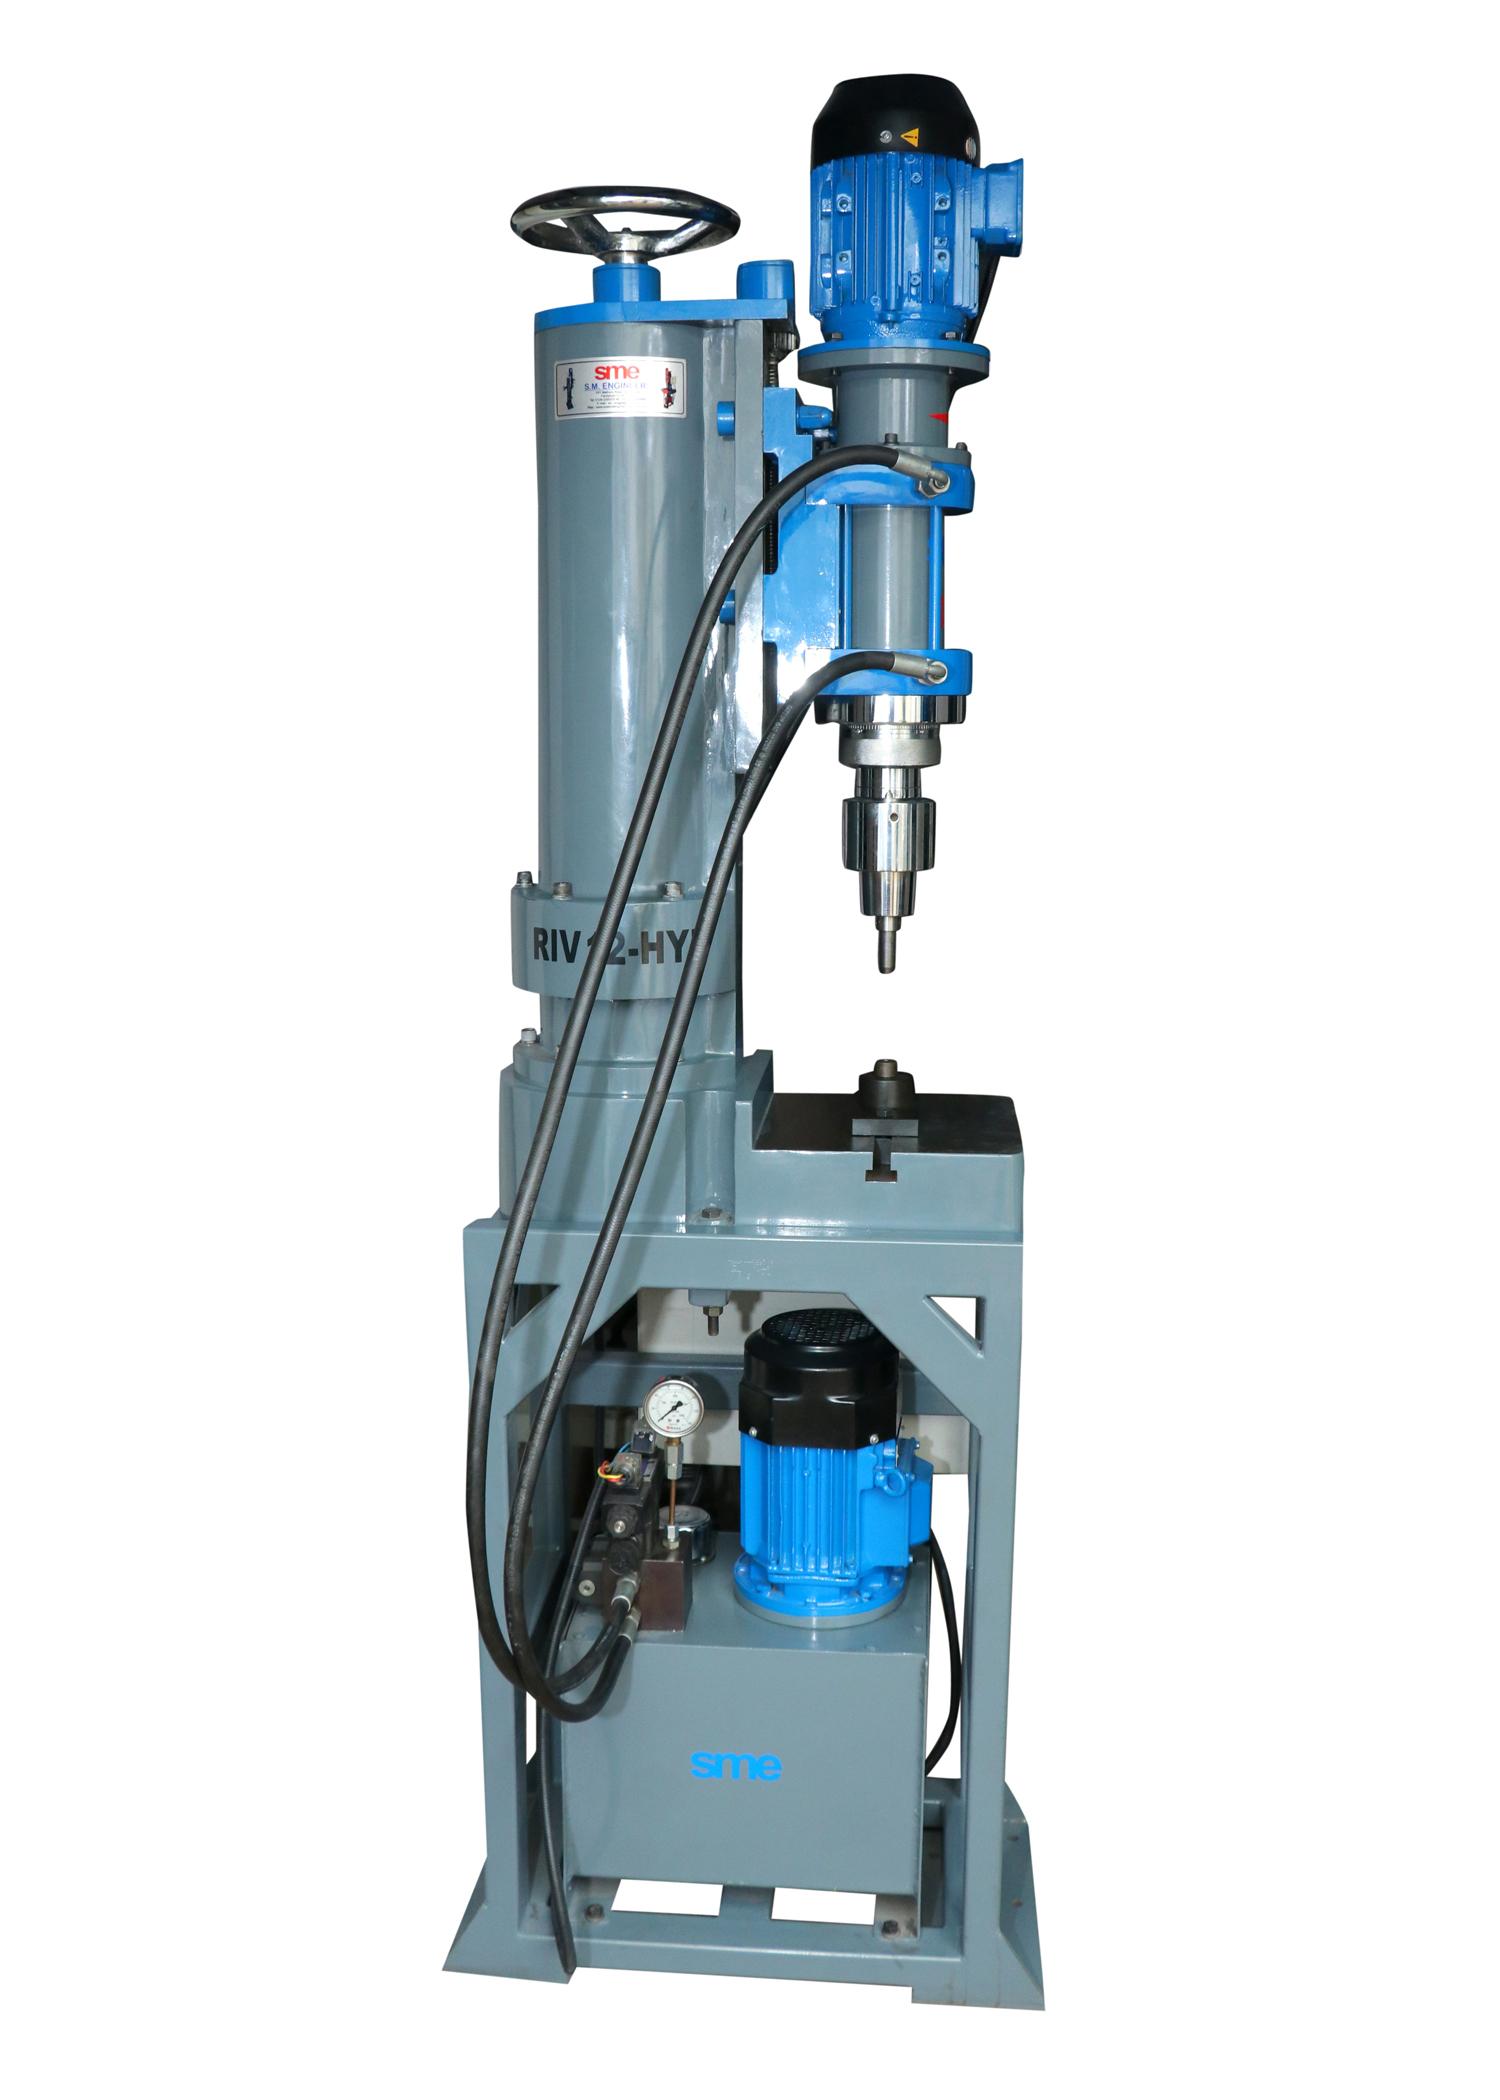 Hydraulic Spin Riveting Machine